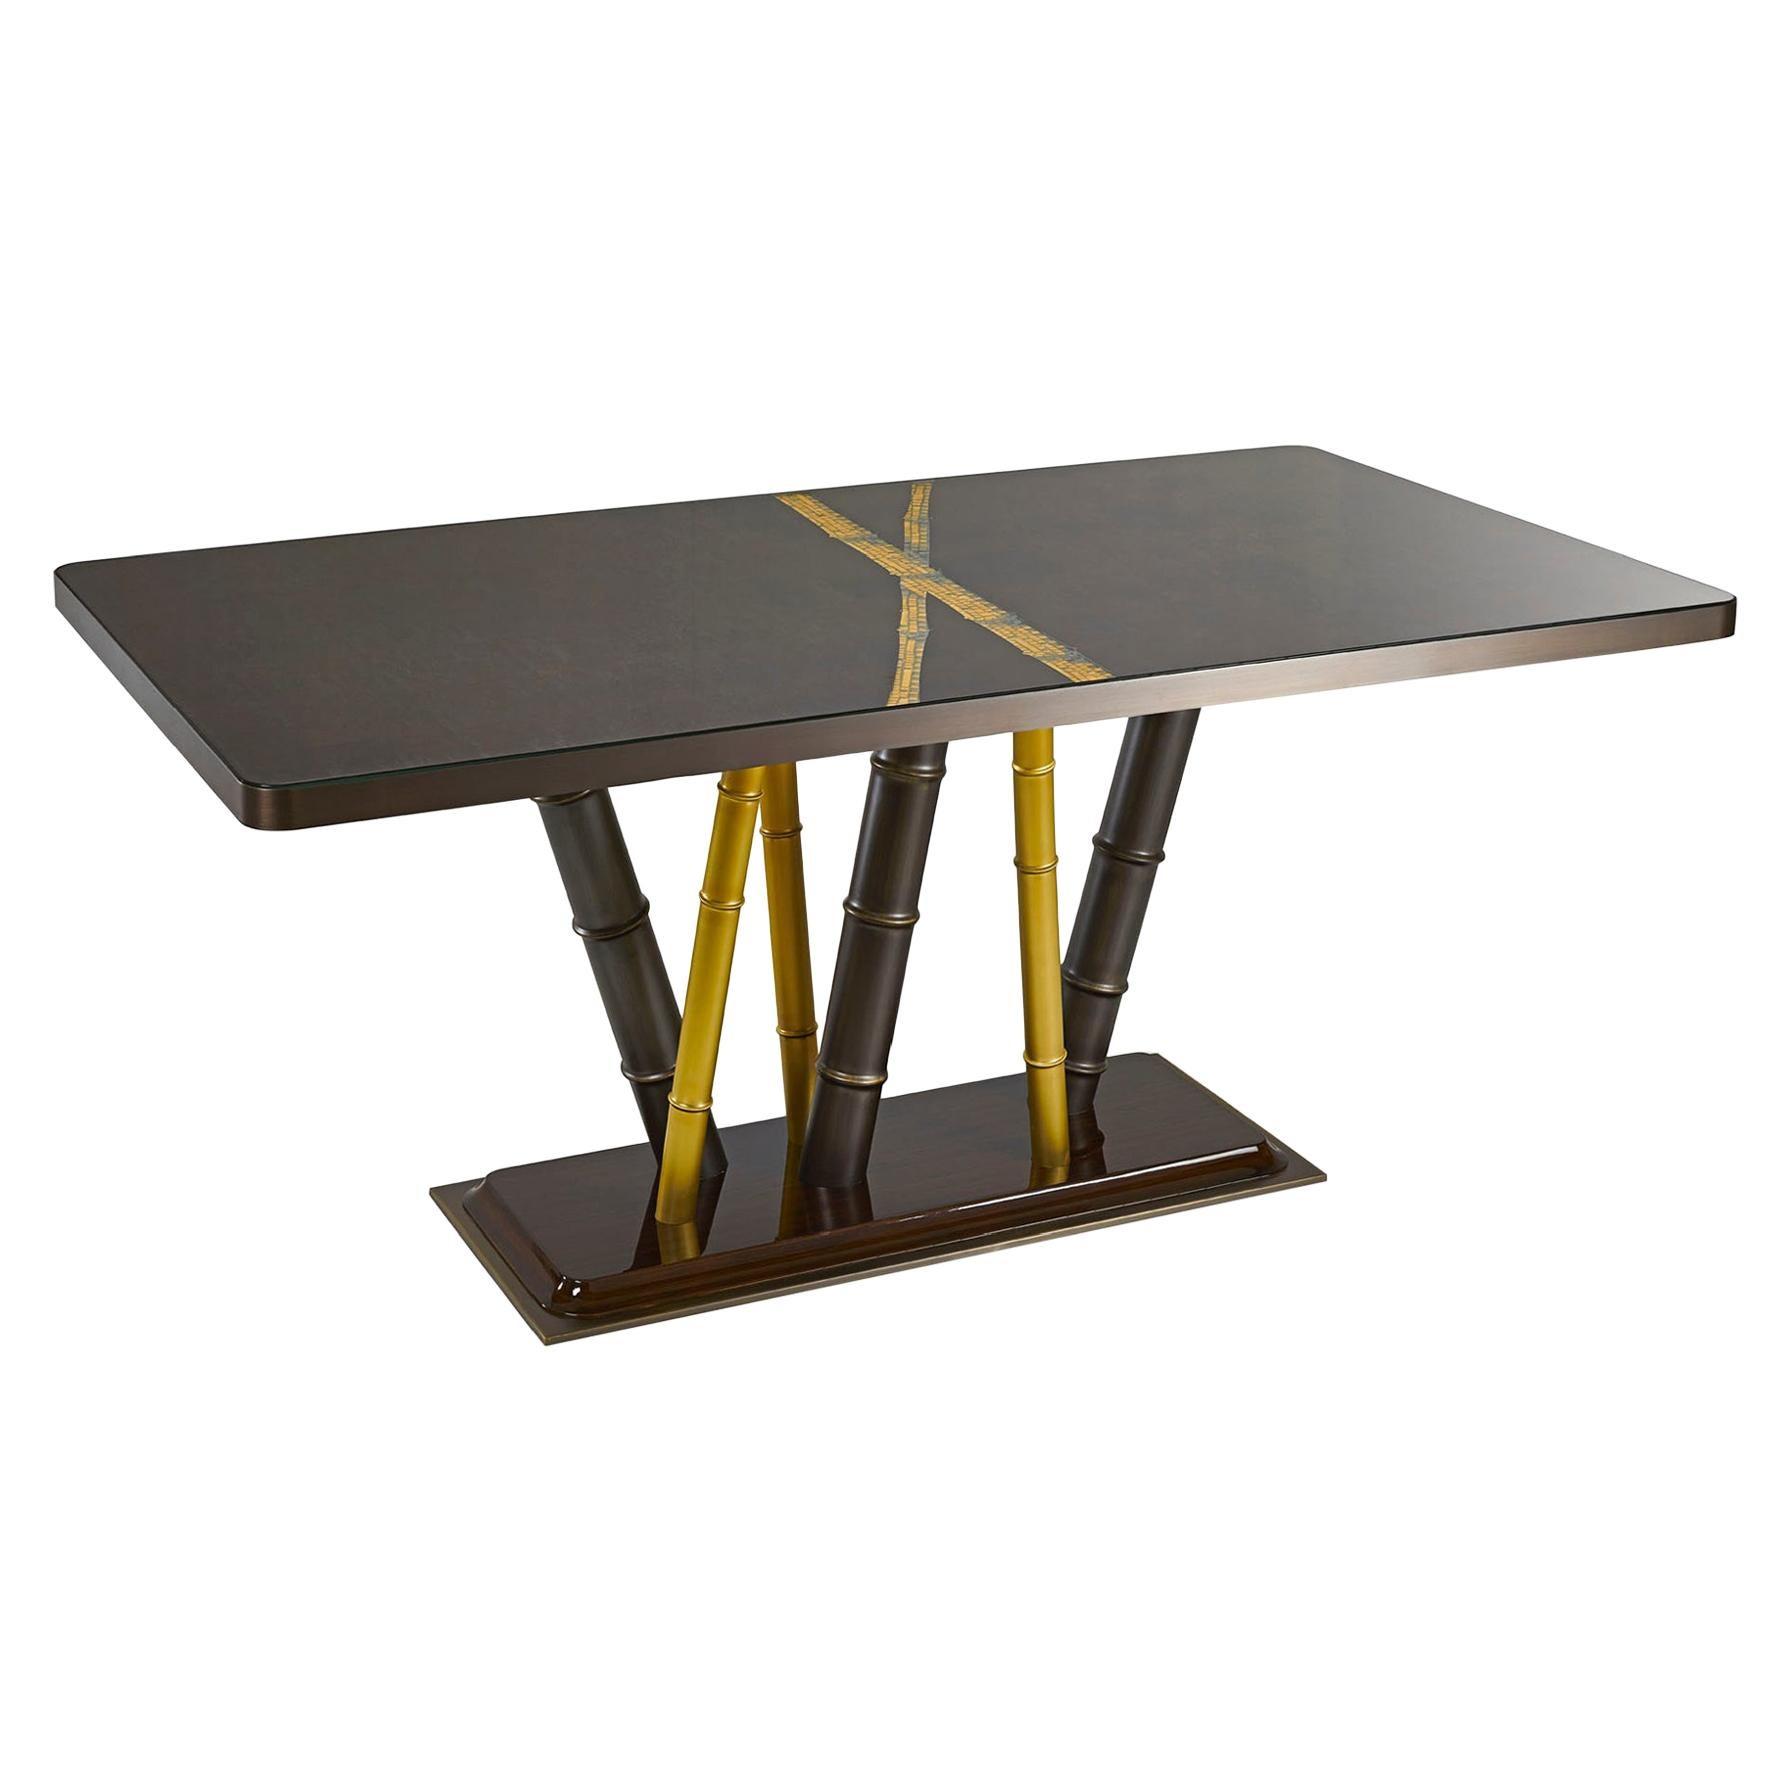 Table Bronze Leaf Glass Top Decorative Mosaic Insert Brass Legs Glossy Ebony